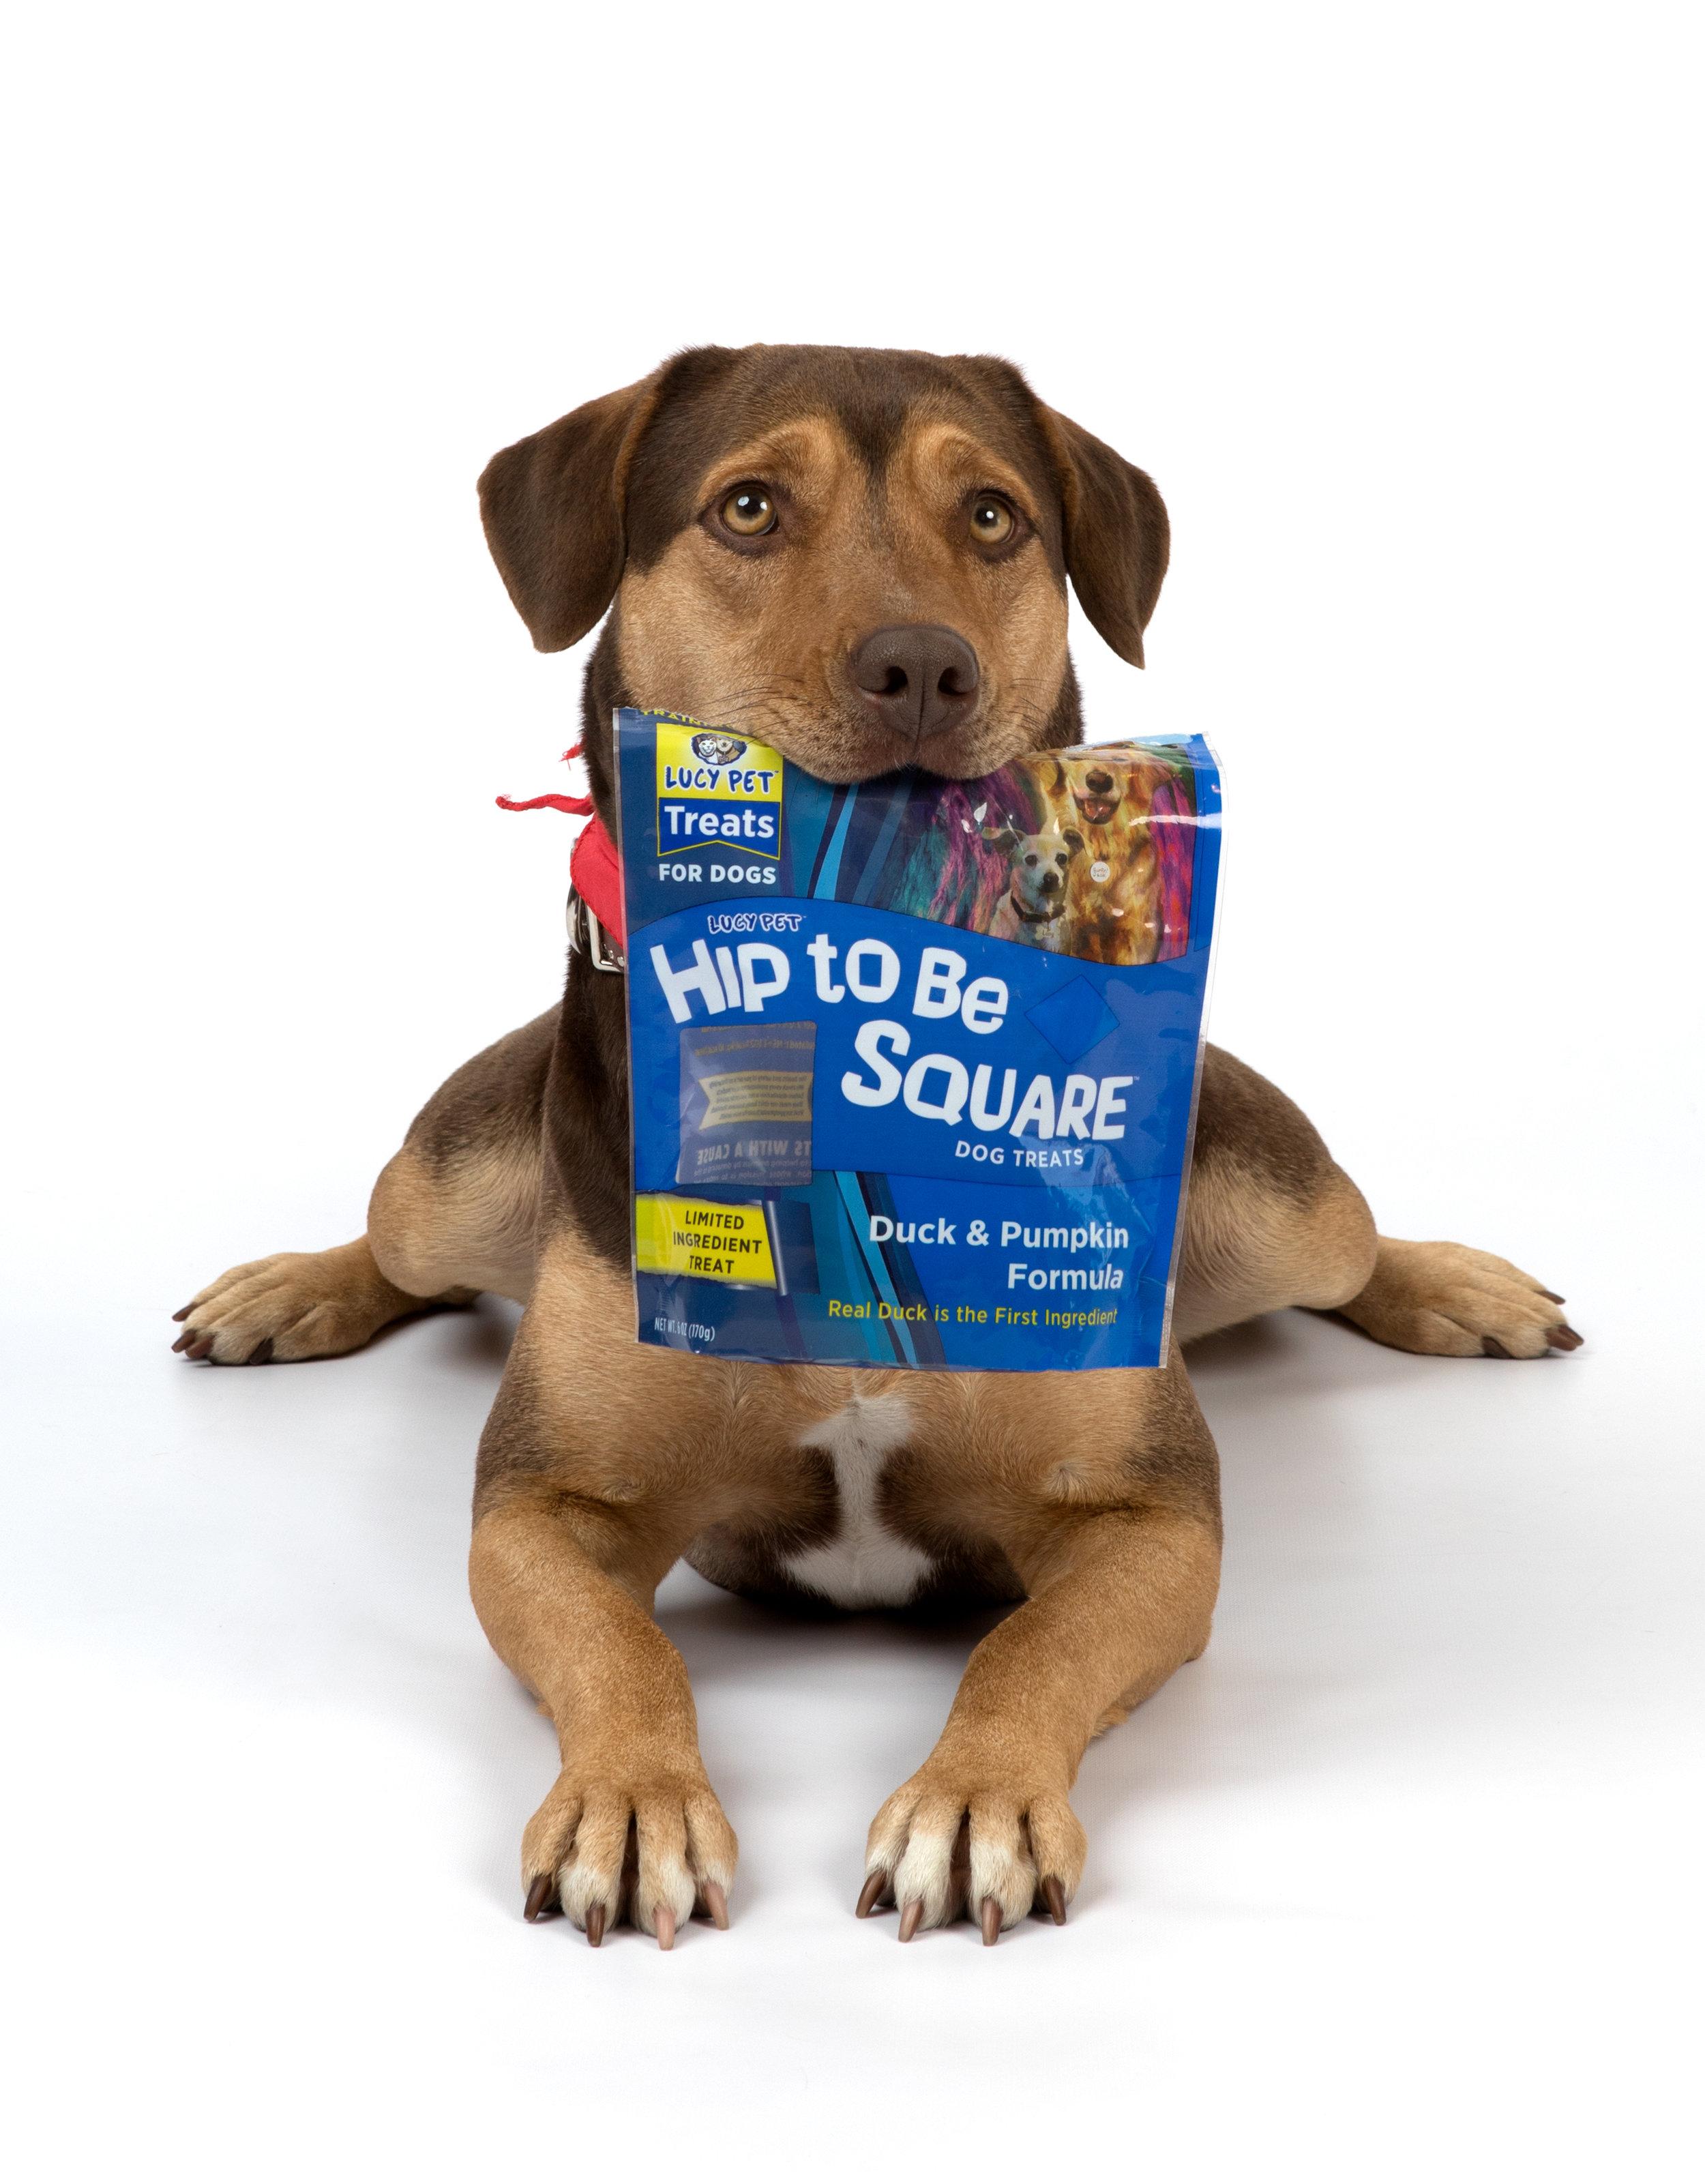 A Dogs Way_Press Junket_Danielle_Spires-1590.jpg